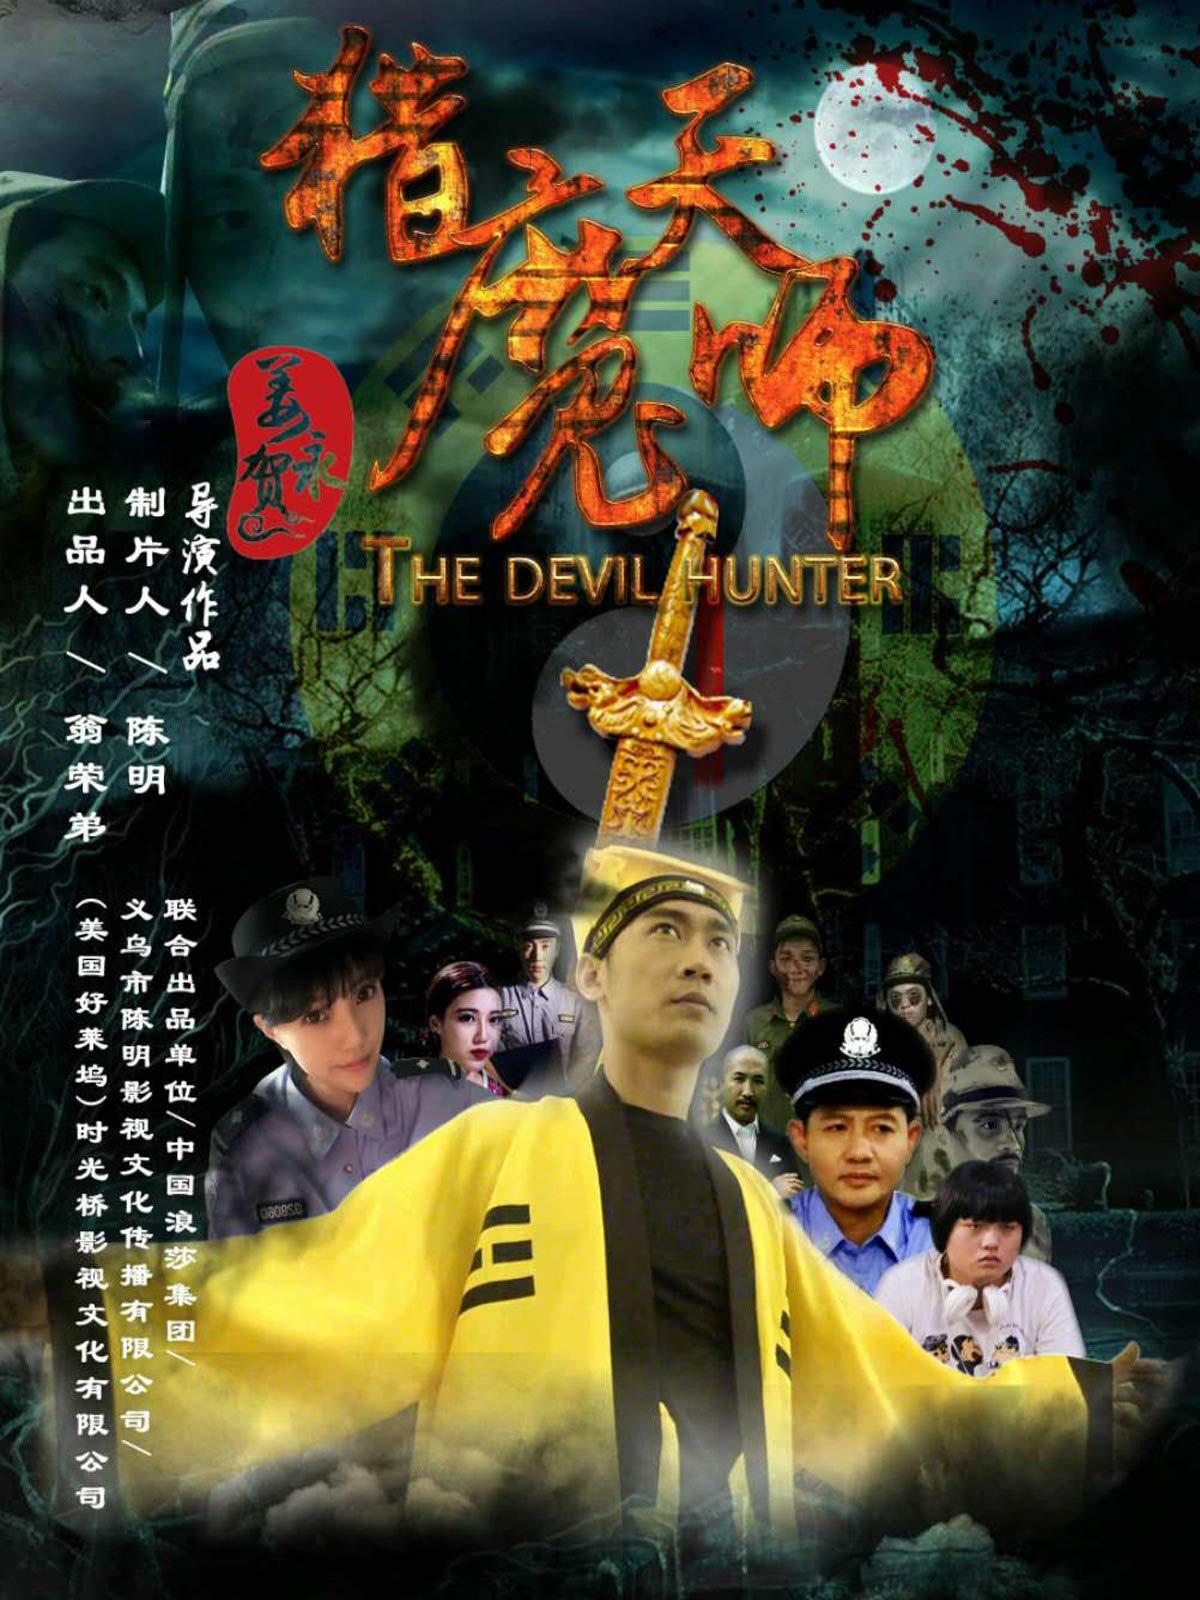 The Devil Hunter